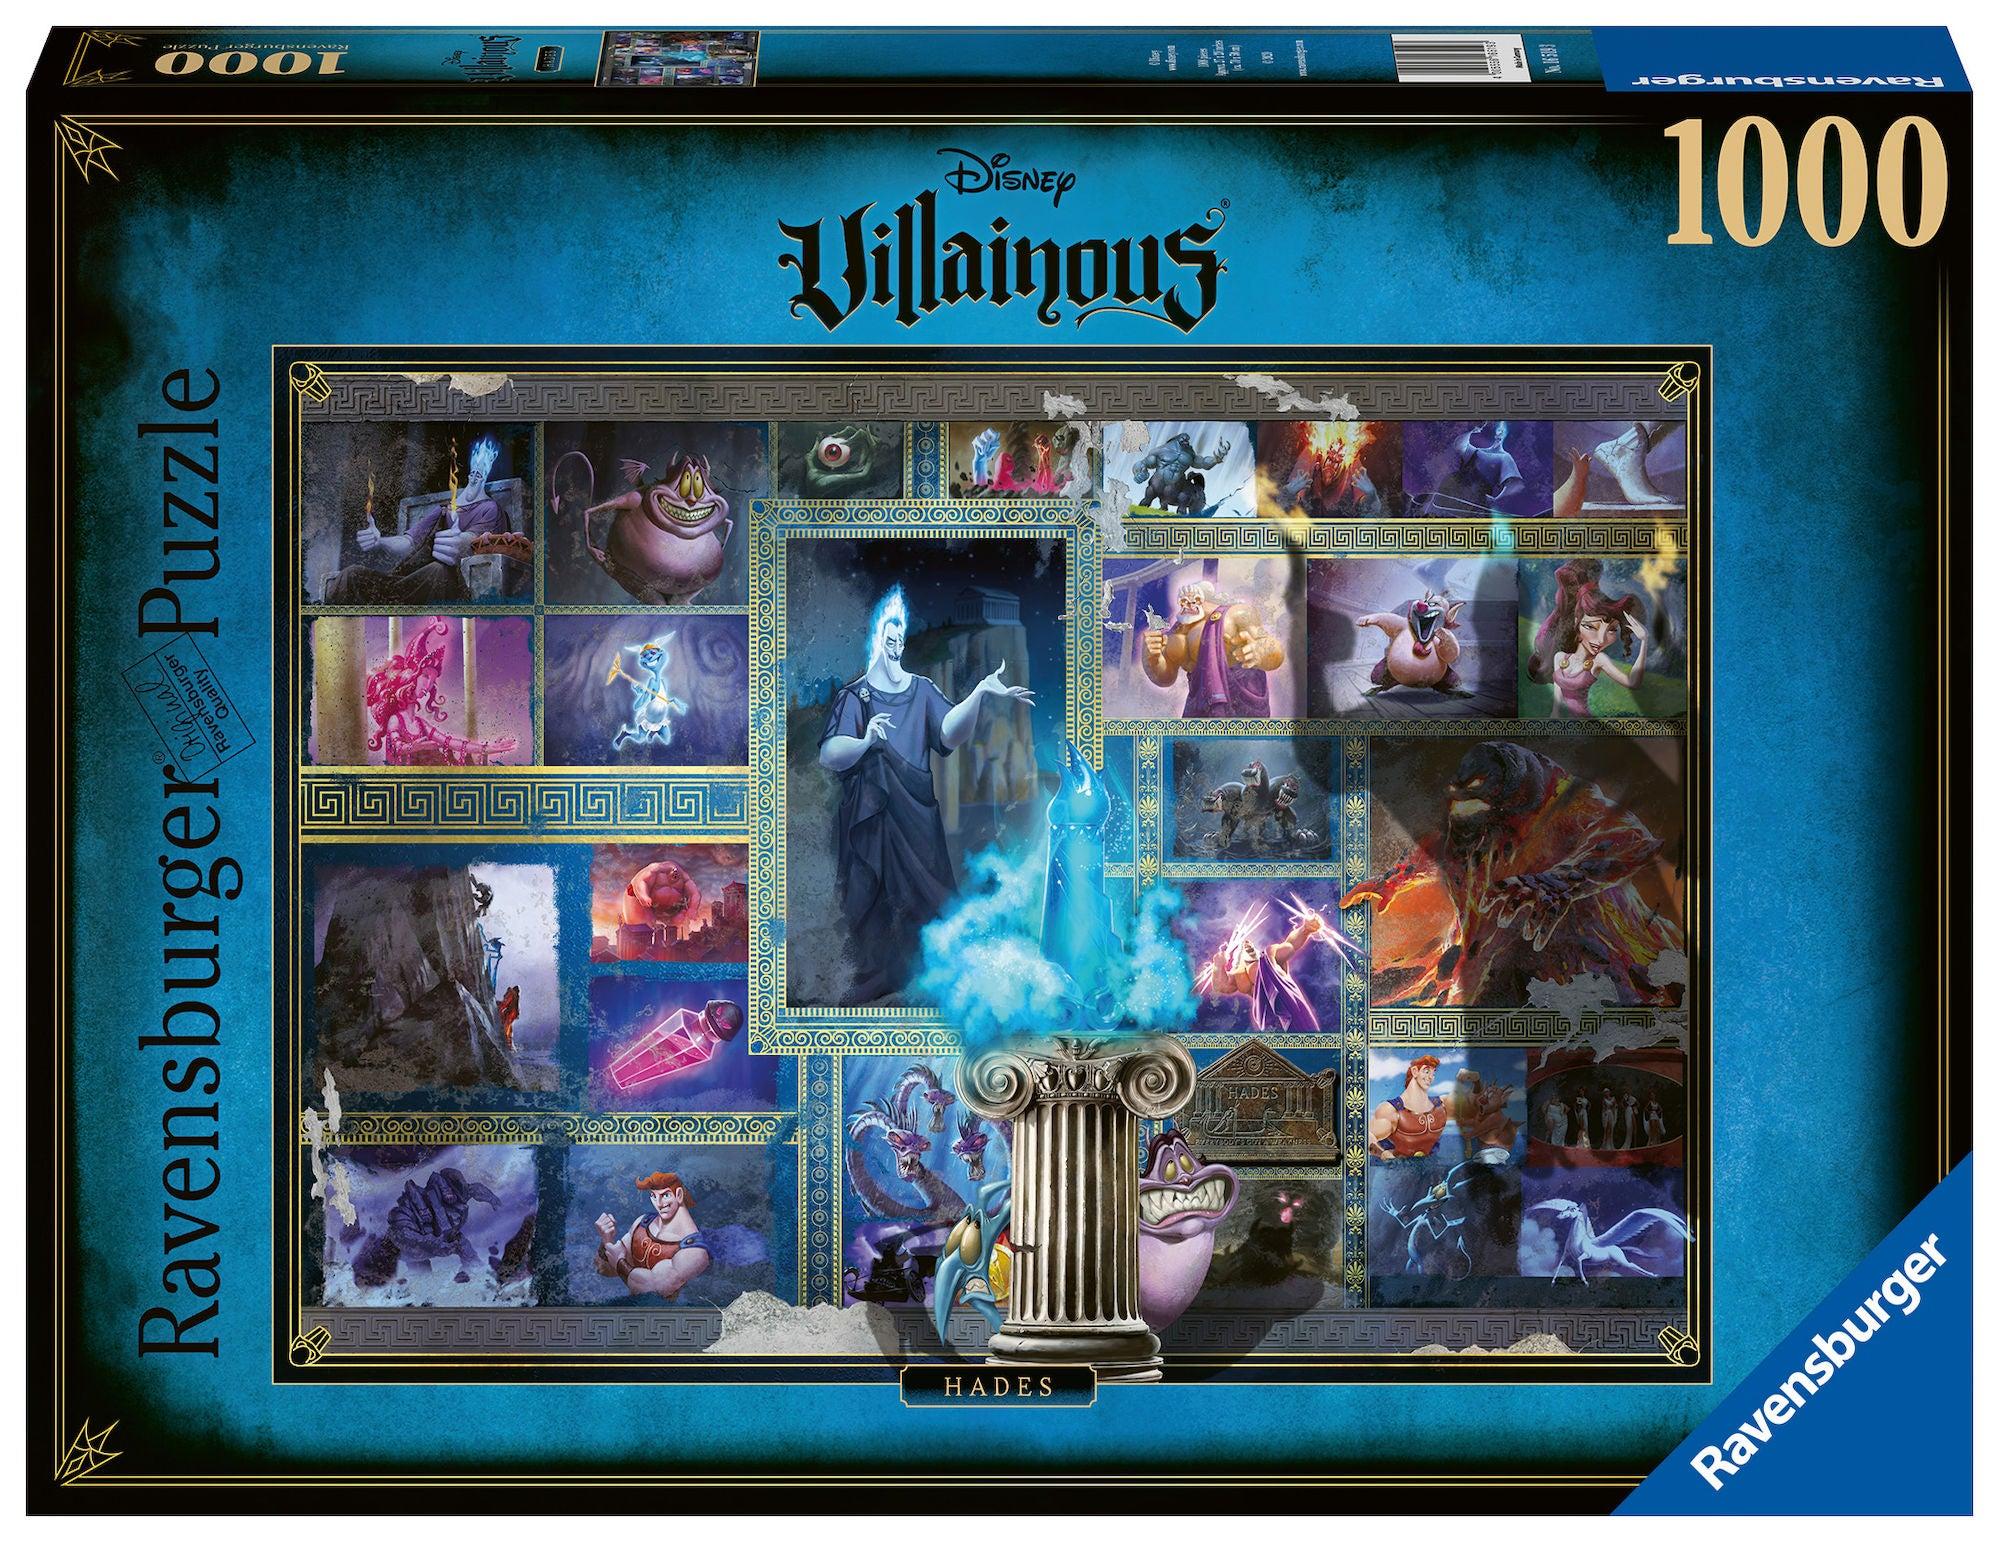 Ravensburger Pussel Disney Villainous: Hades 1000 Bitar